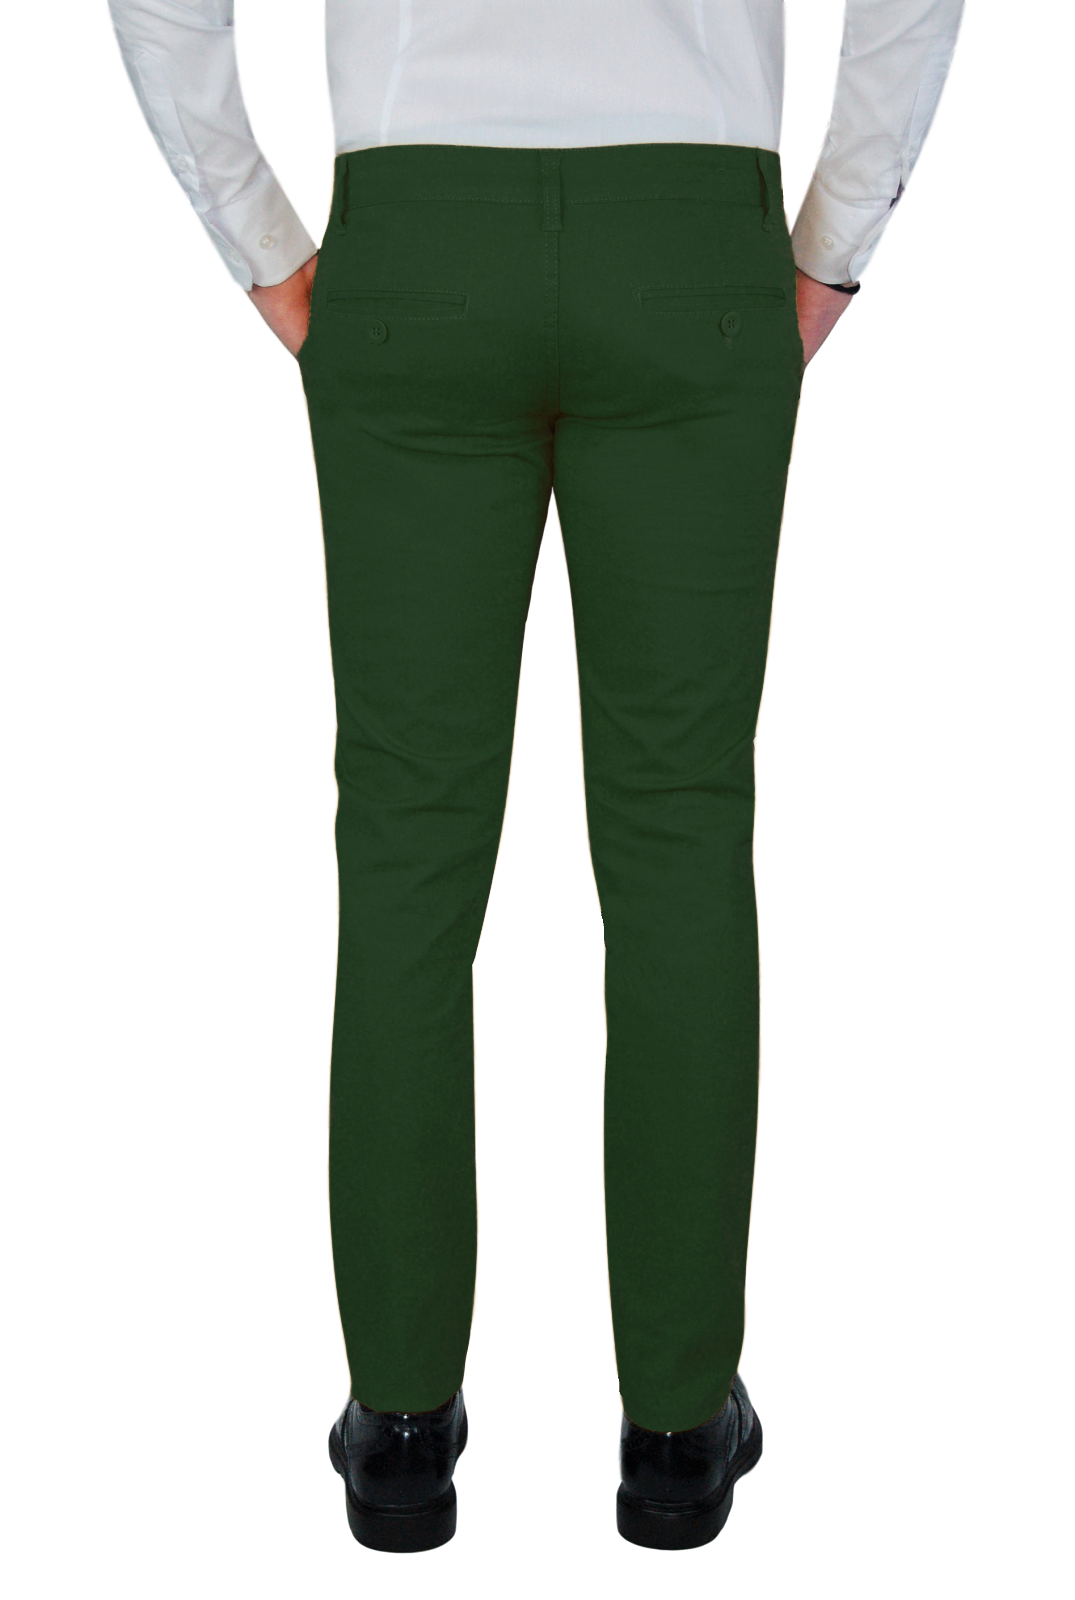 Pantalone-Uomo-Chino-Primaverile-slim-fit-Pantaloni-Eleganti-Blu-Verde-Nero miniatura 19